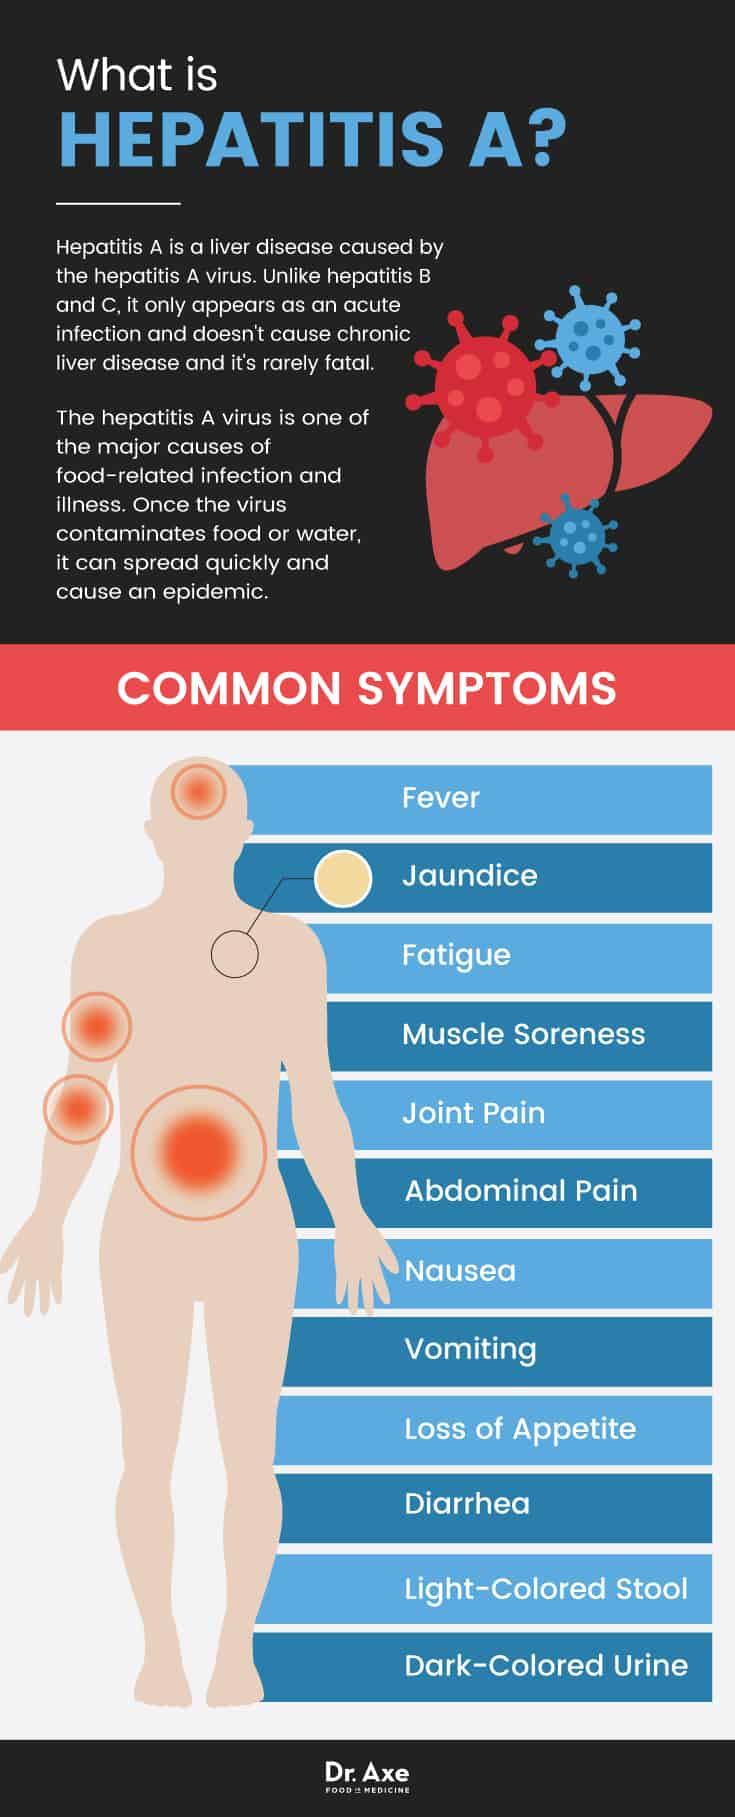 Hepatitis a symptoms - Dr. Axe